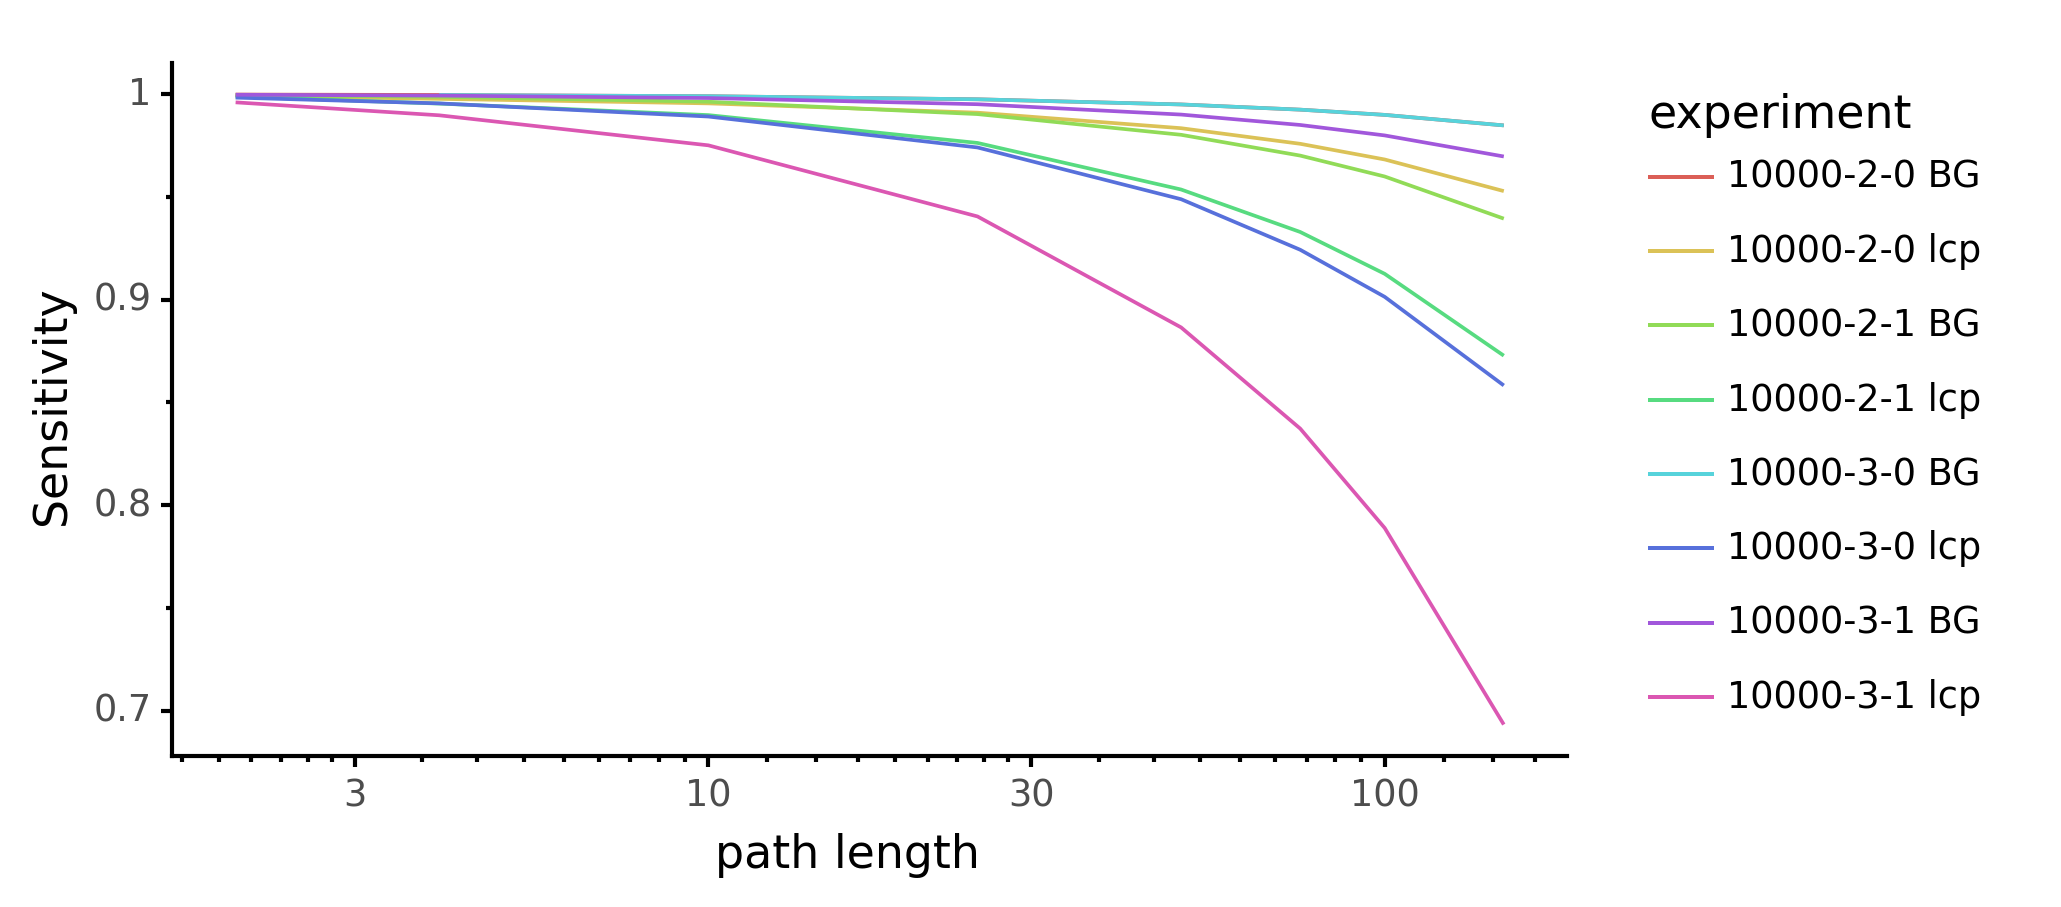 figs/fig1_data_10k_sens.png